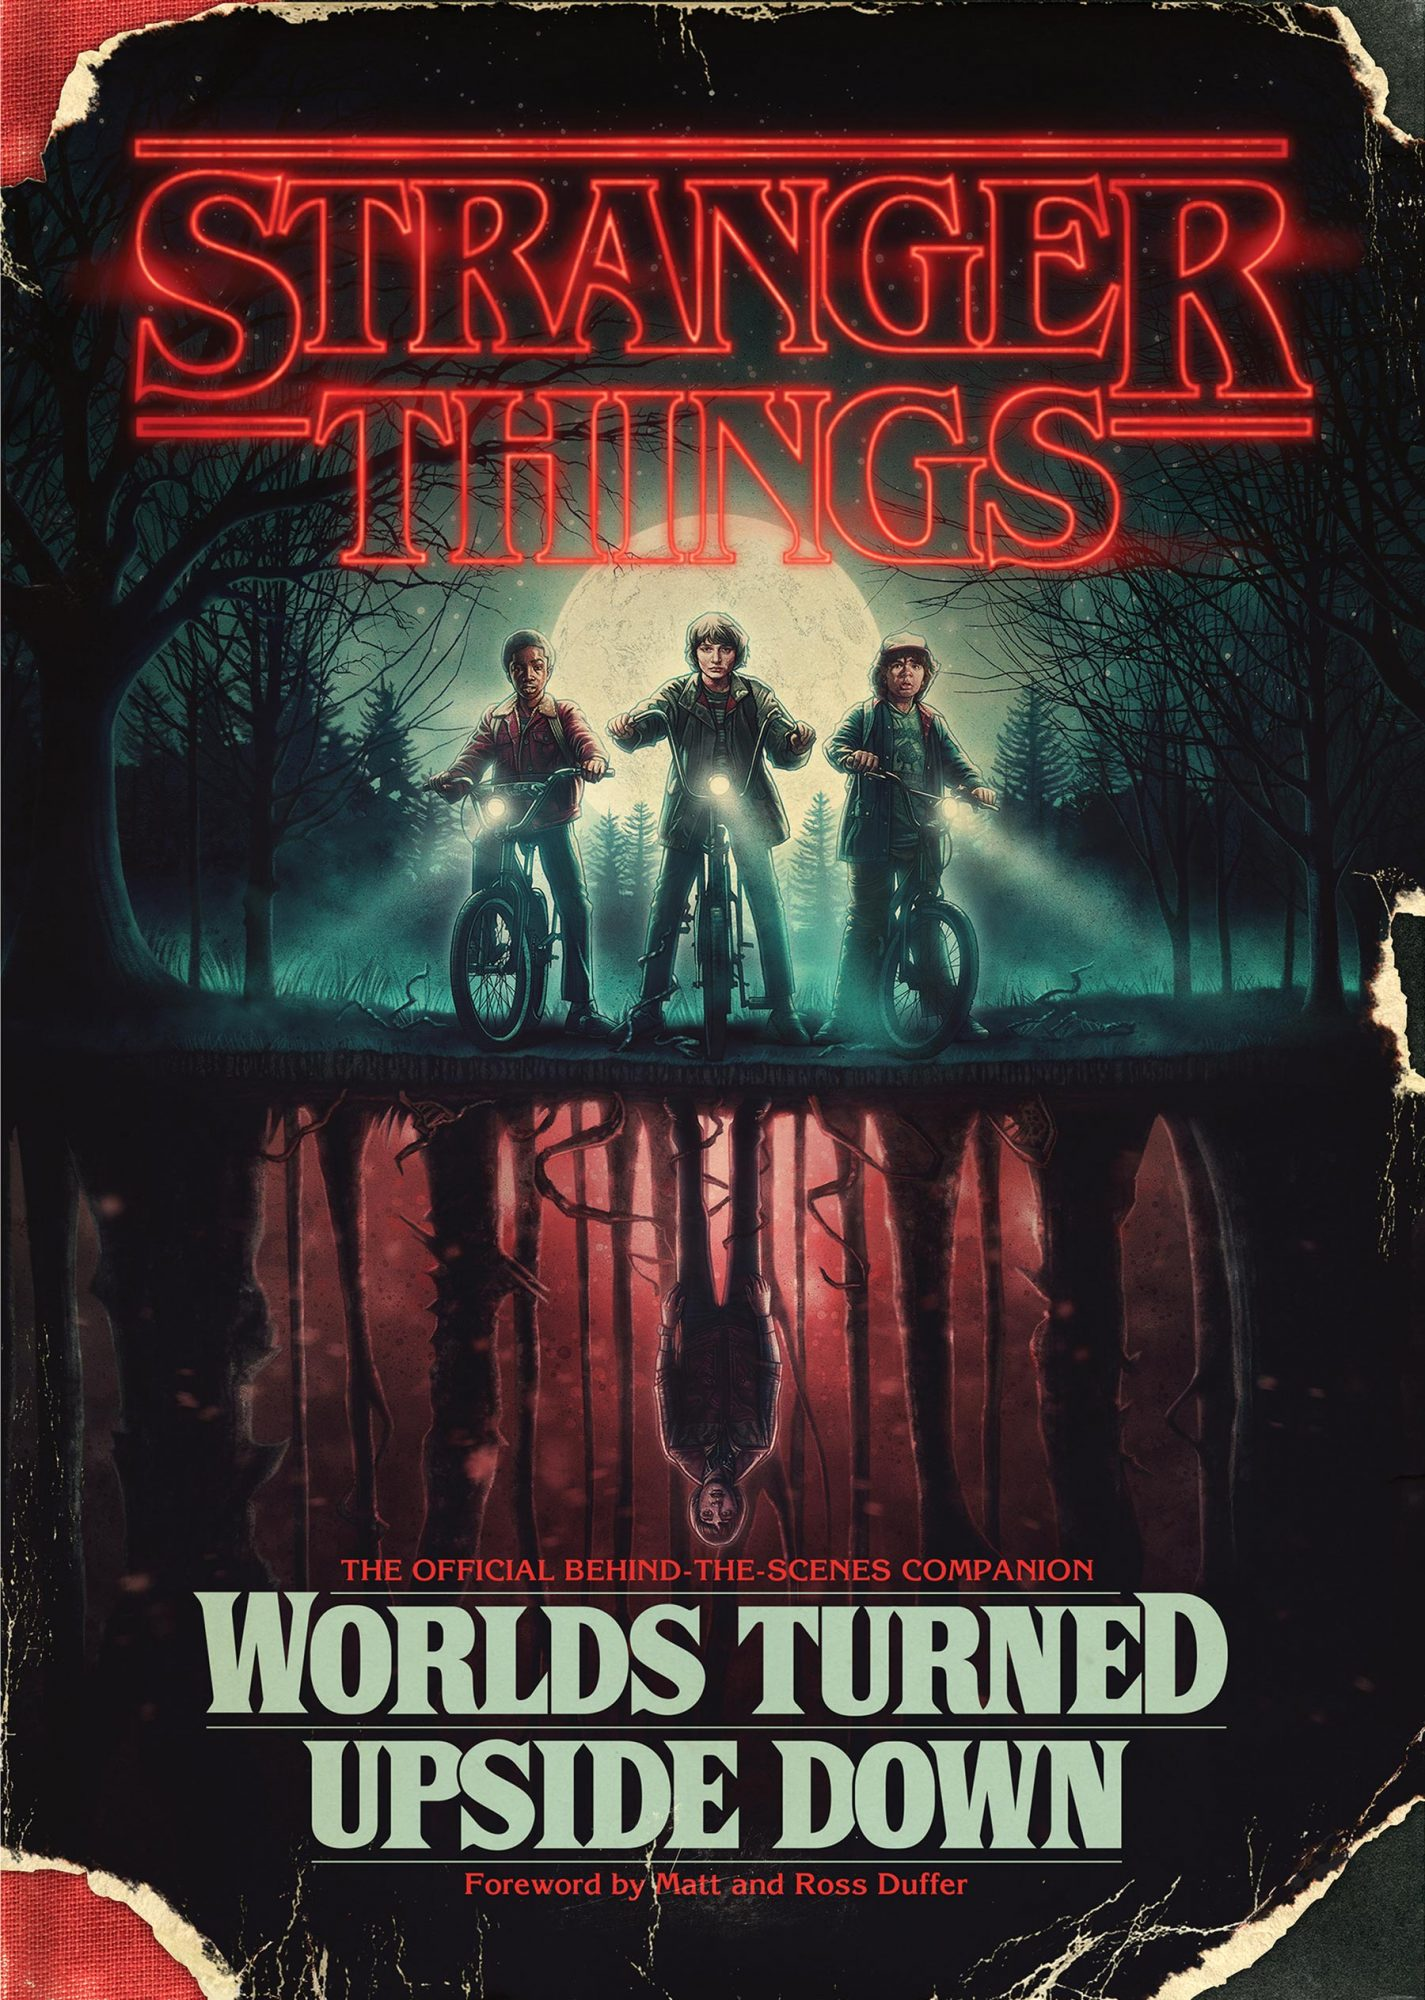 STRANGER-THINGS_WORLDS-TURNED-UPSIDE-DOWN_cover